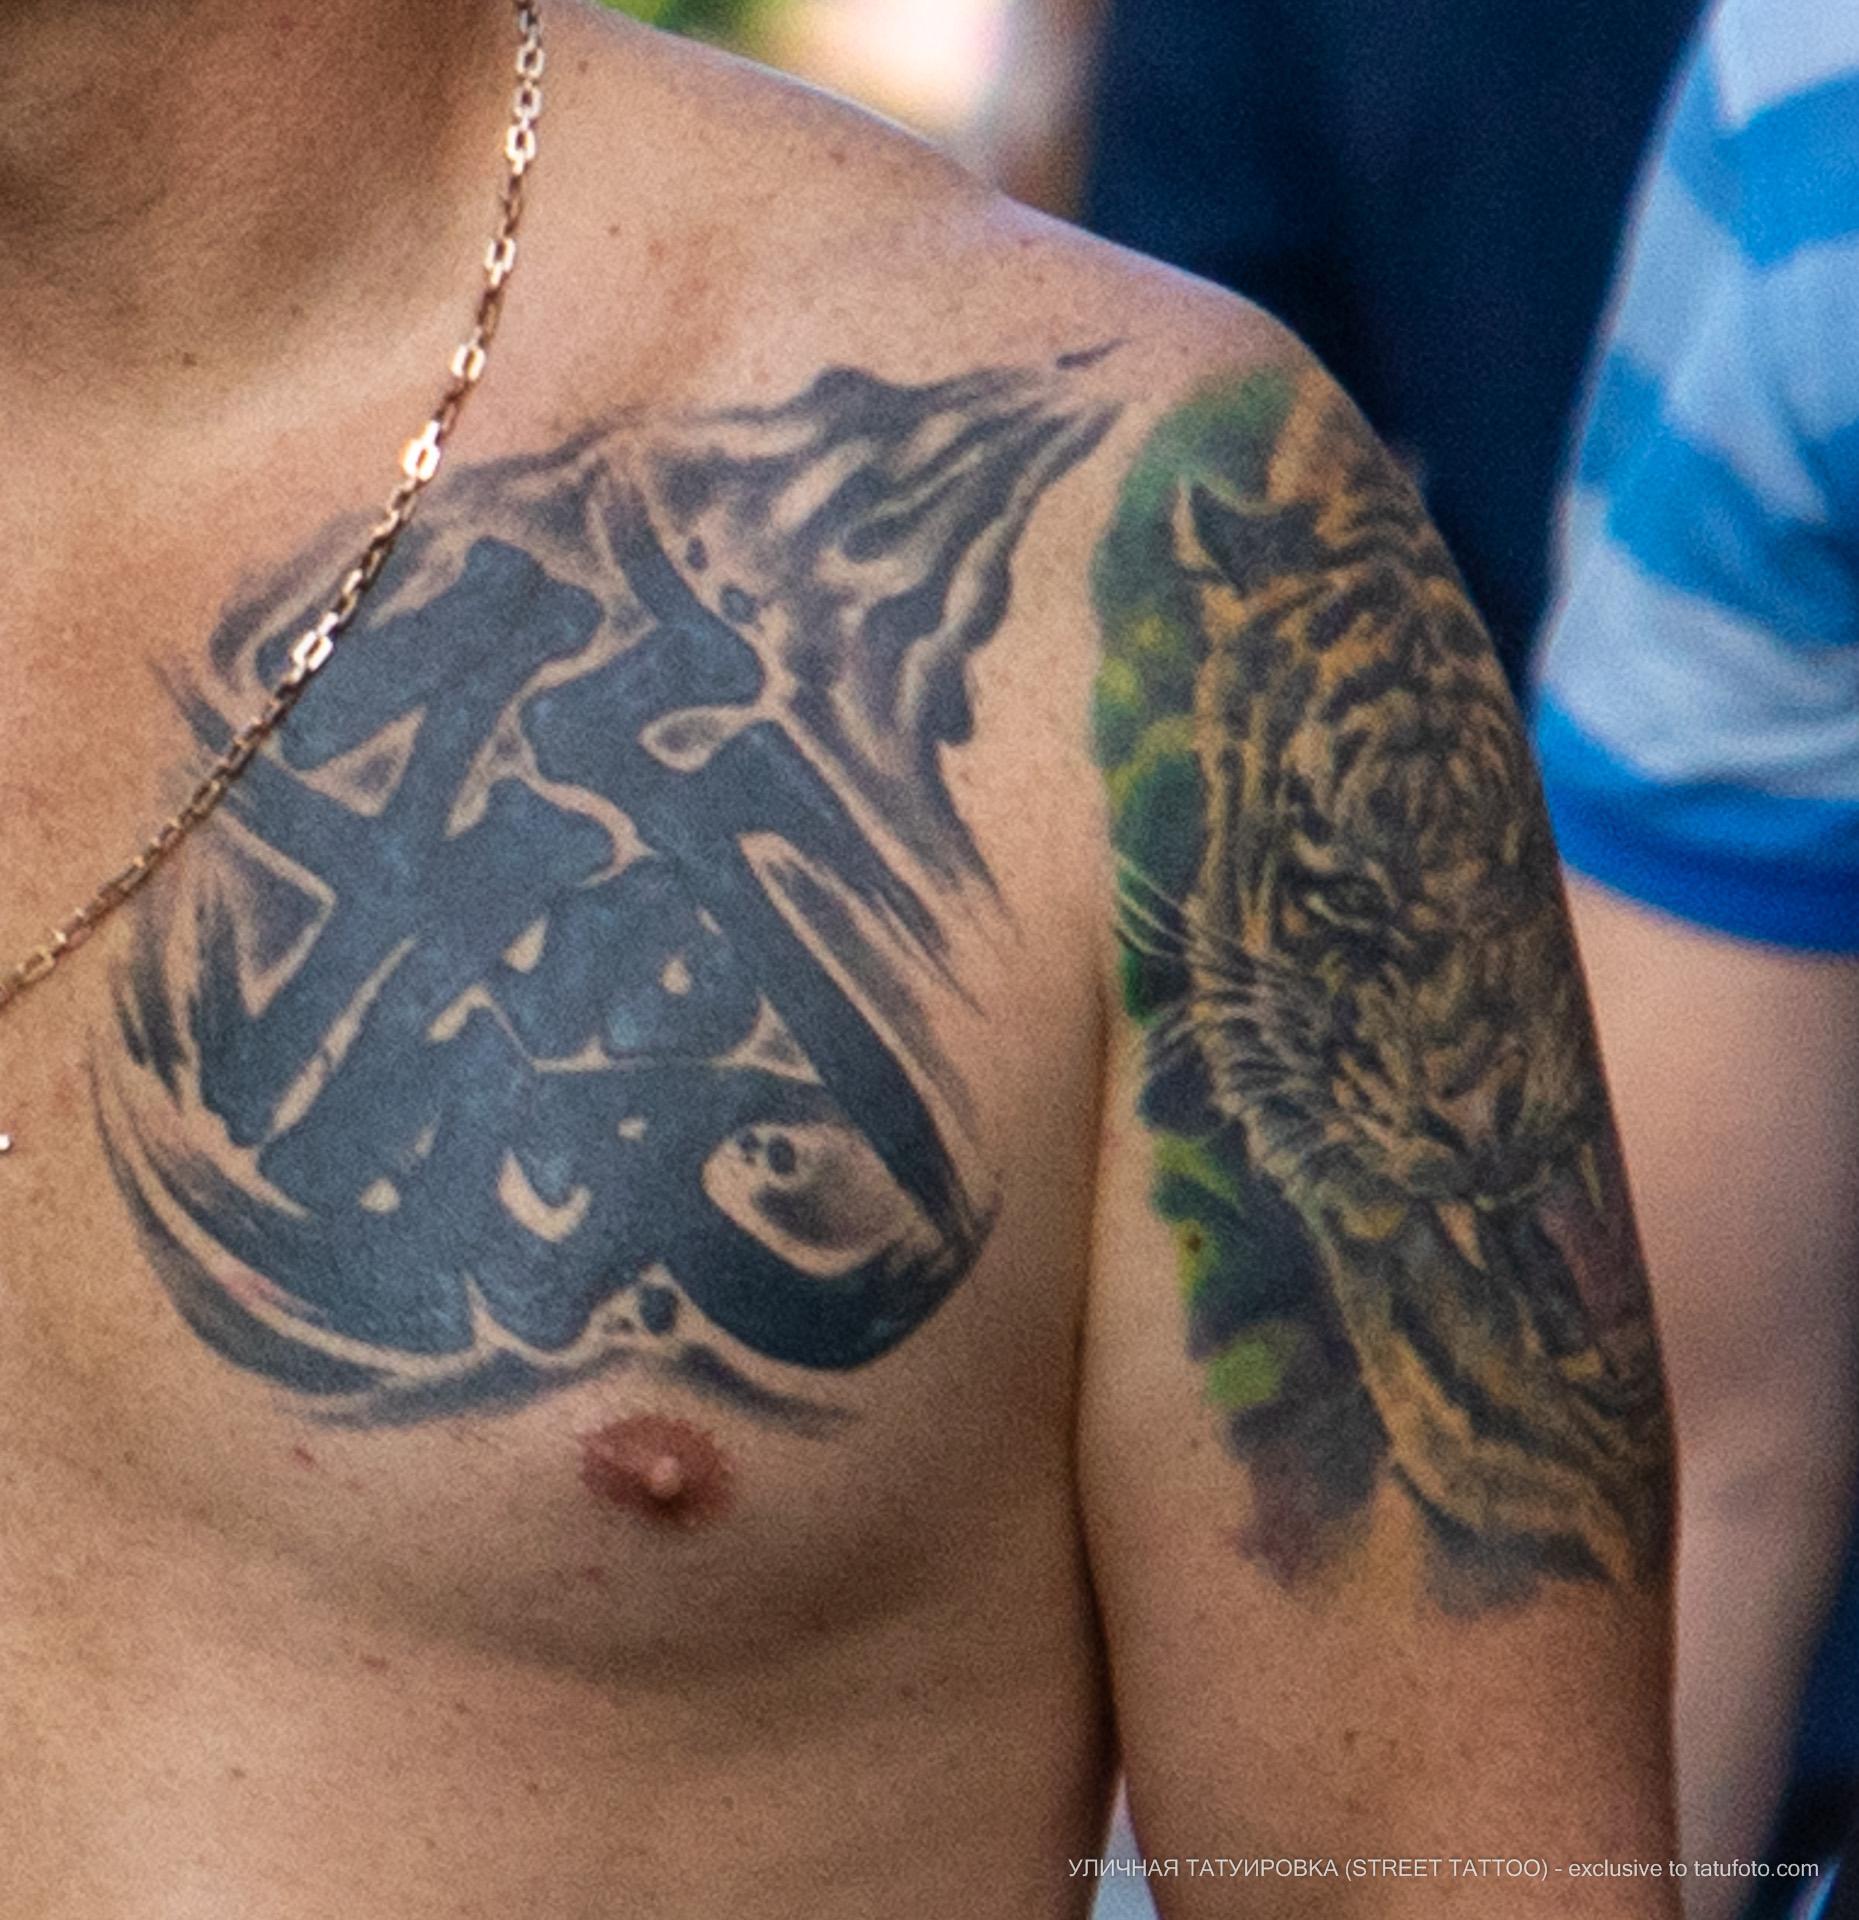 Тату с узорами на левой части груди мужчины - Уличная татуировка (street tattoo) № 06 – 18.06.2020 – tatufoto.com